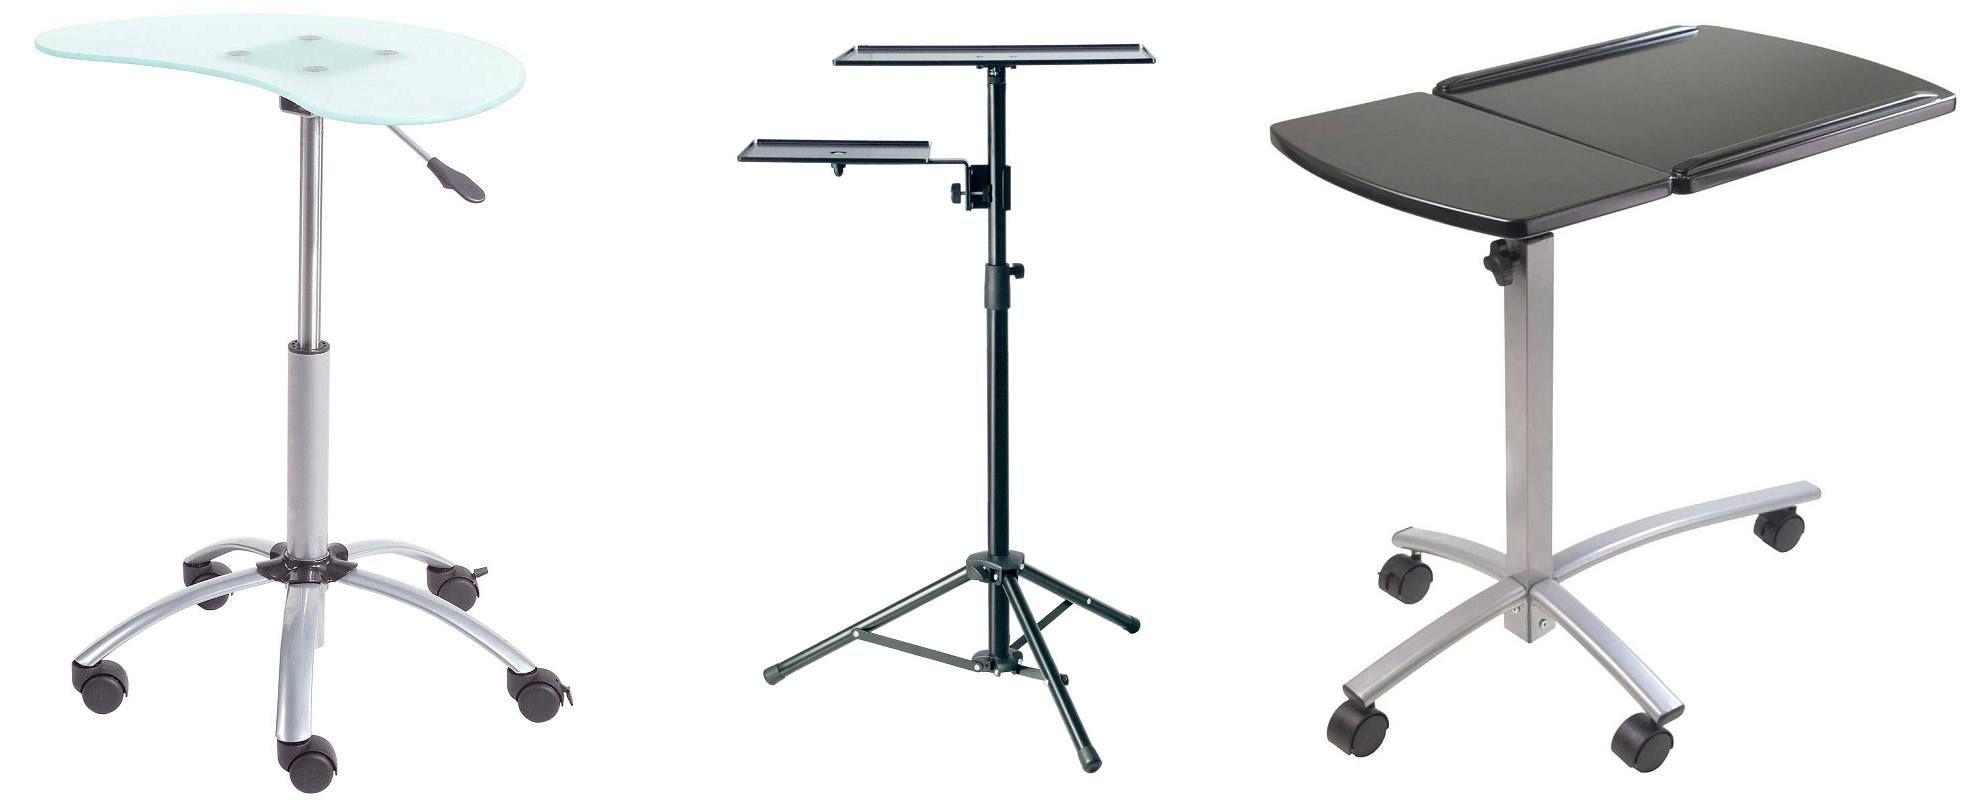 Adjustable Height Laptop Table U2013 Easiness, Comfort, Mobility.  Http://bestdesignideas.com/adjustable Height Laptop Table  Easiness Comfort Mobility